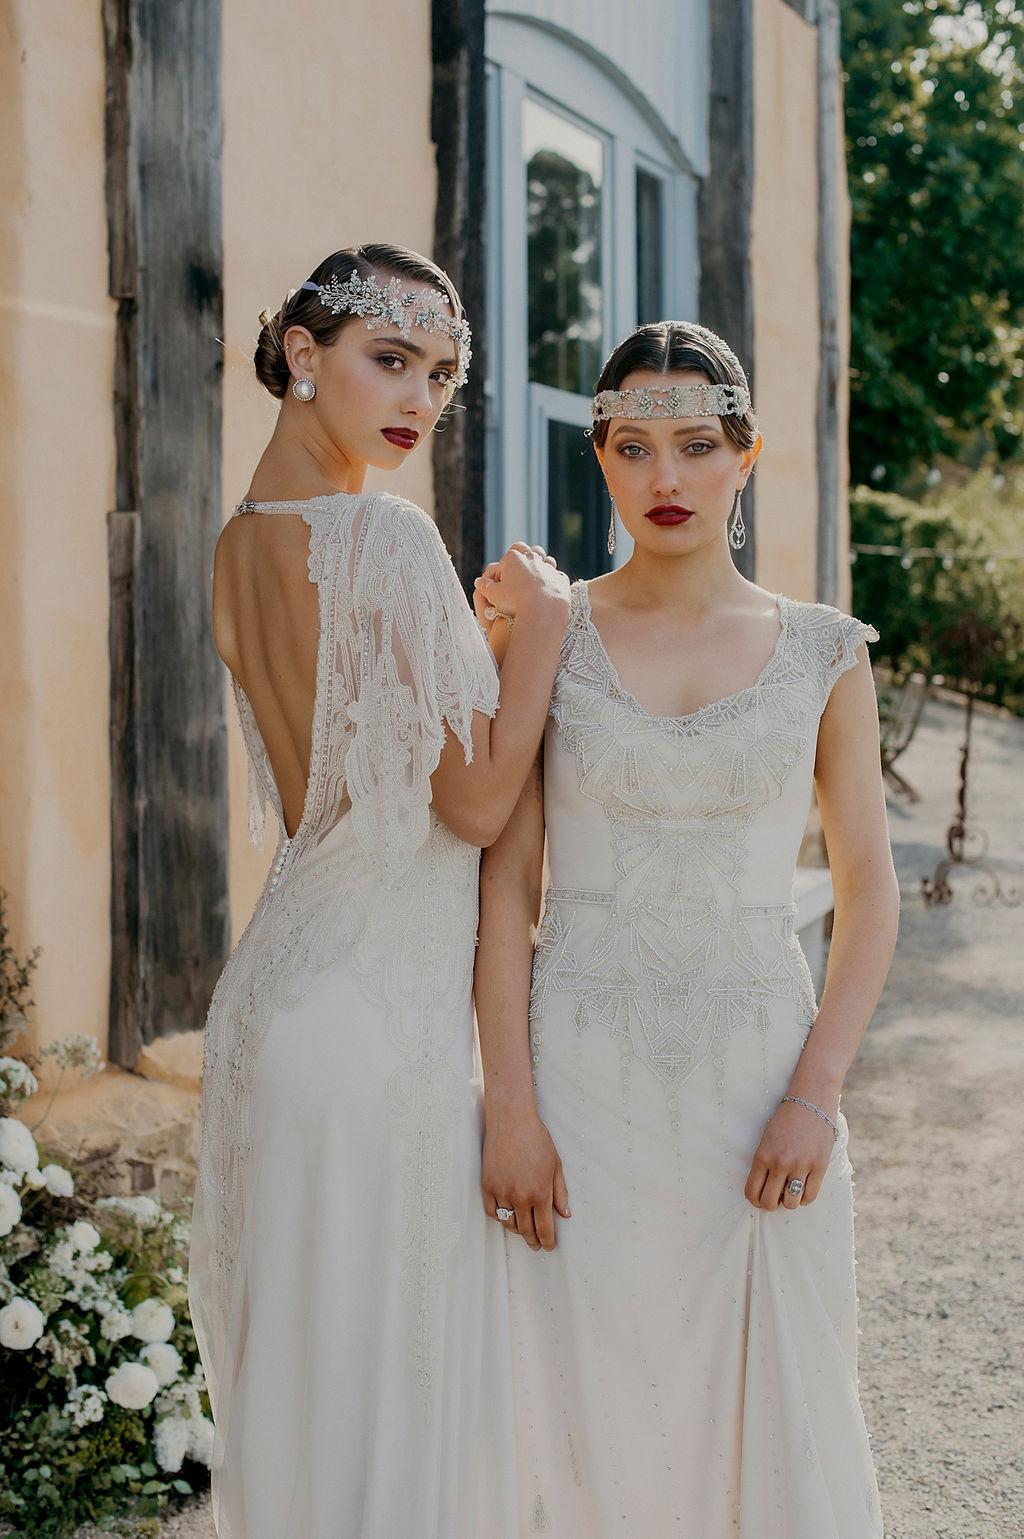 Norma and Elke Gwendolynne Wedding Dress JessicaAbbyartdecoWEB-89.jpg